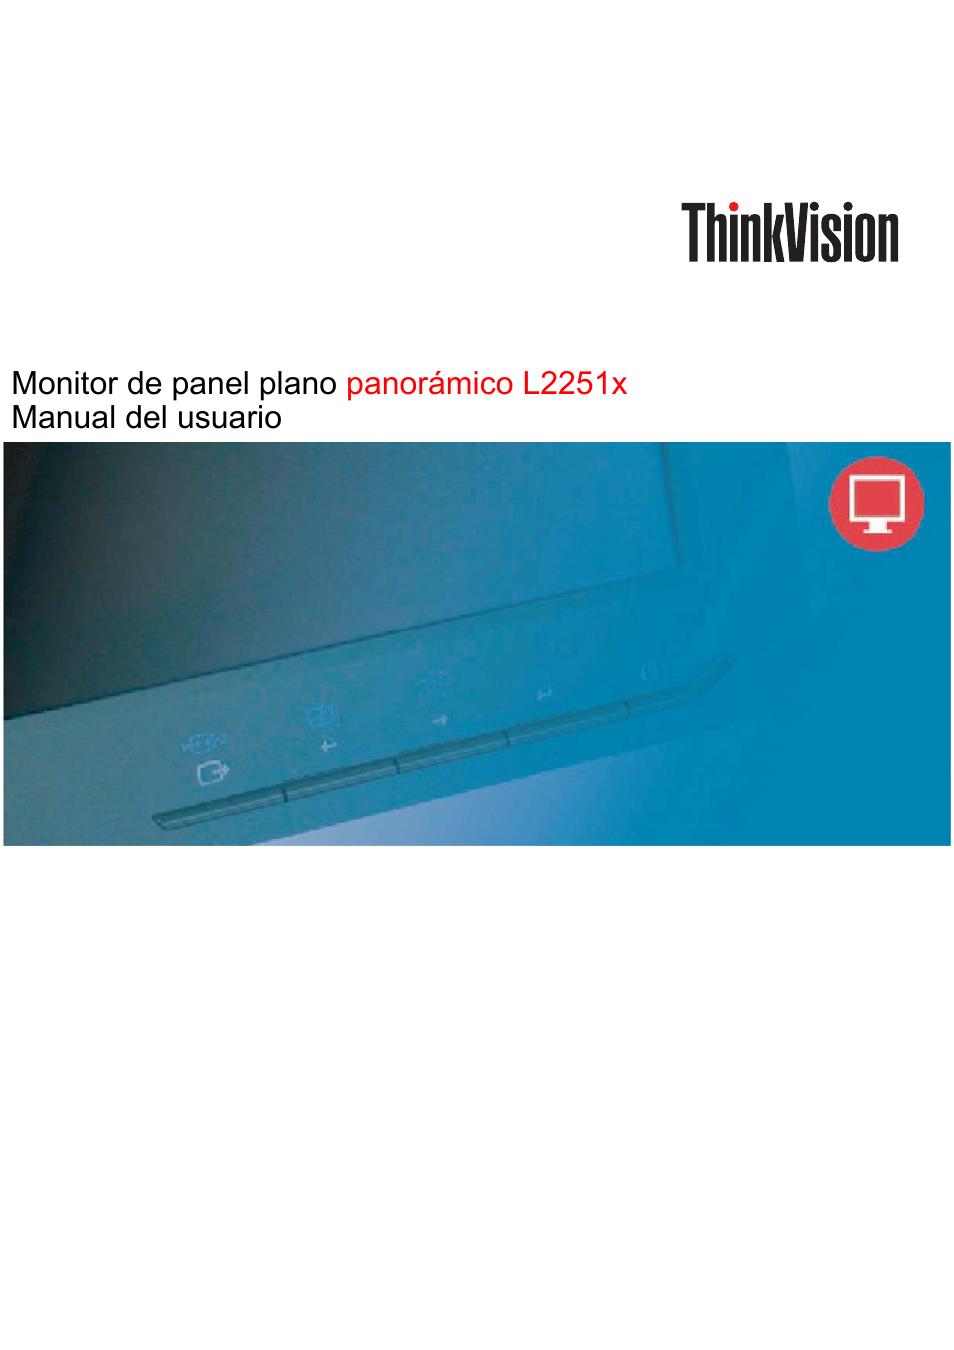 lenovo thinkvision l2251x wide 22in lcd monitor manual del usuario rh pdfmanuales com Lenovo ThinkVision LT1423 Release Date ThinkVision Lenovo 4431-Hb2